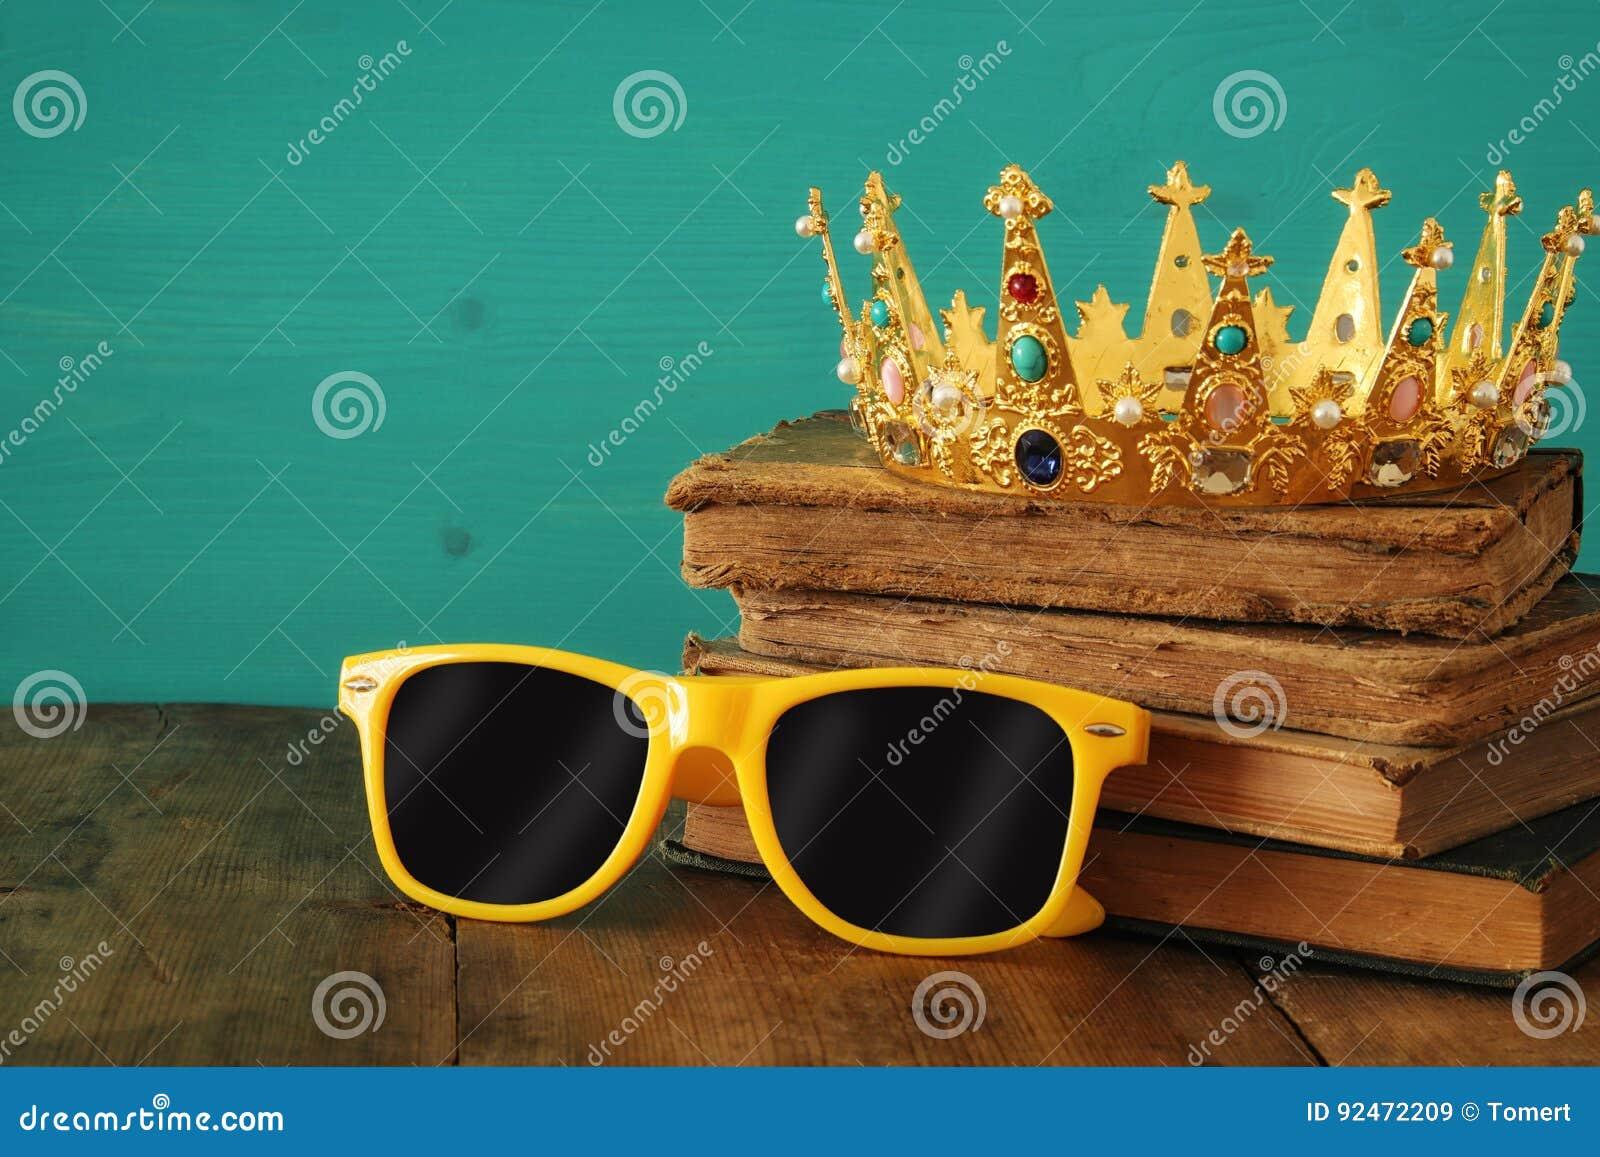 2f8c5aec51 Προσωπικότητα και μοναδική έννοια Παλαιά μεσαιωνική χρυσή κορώνα και  δροσερά γυαλιά ηλίου